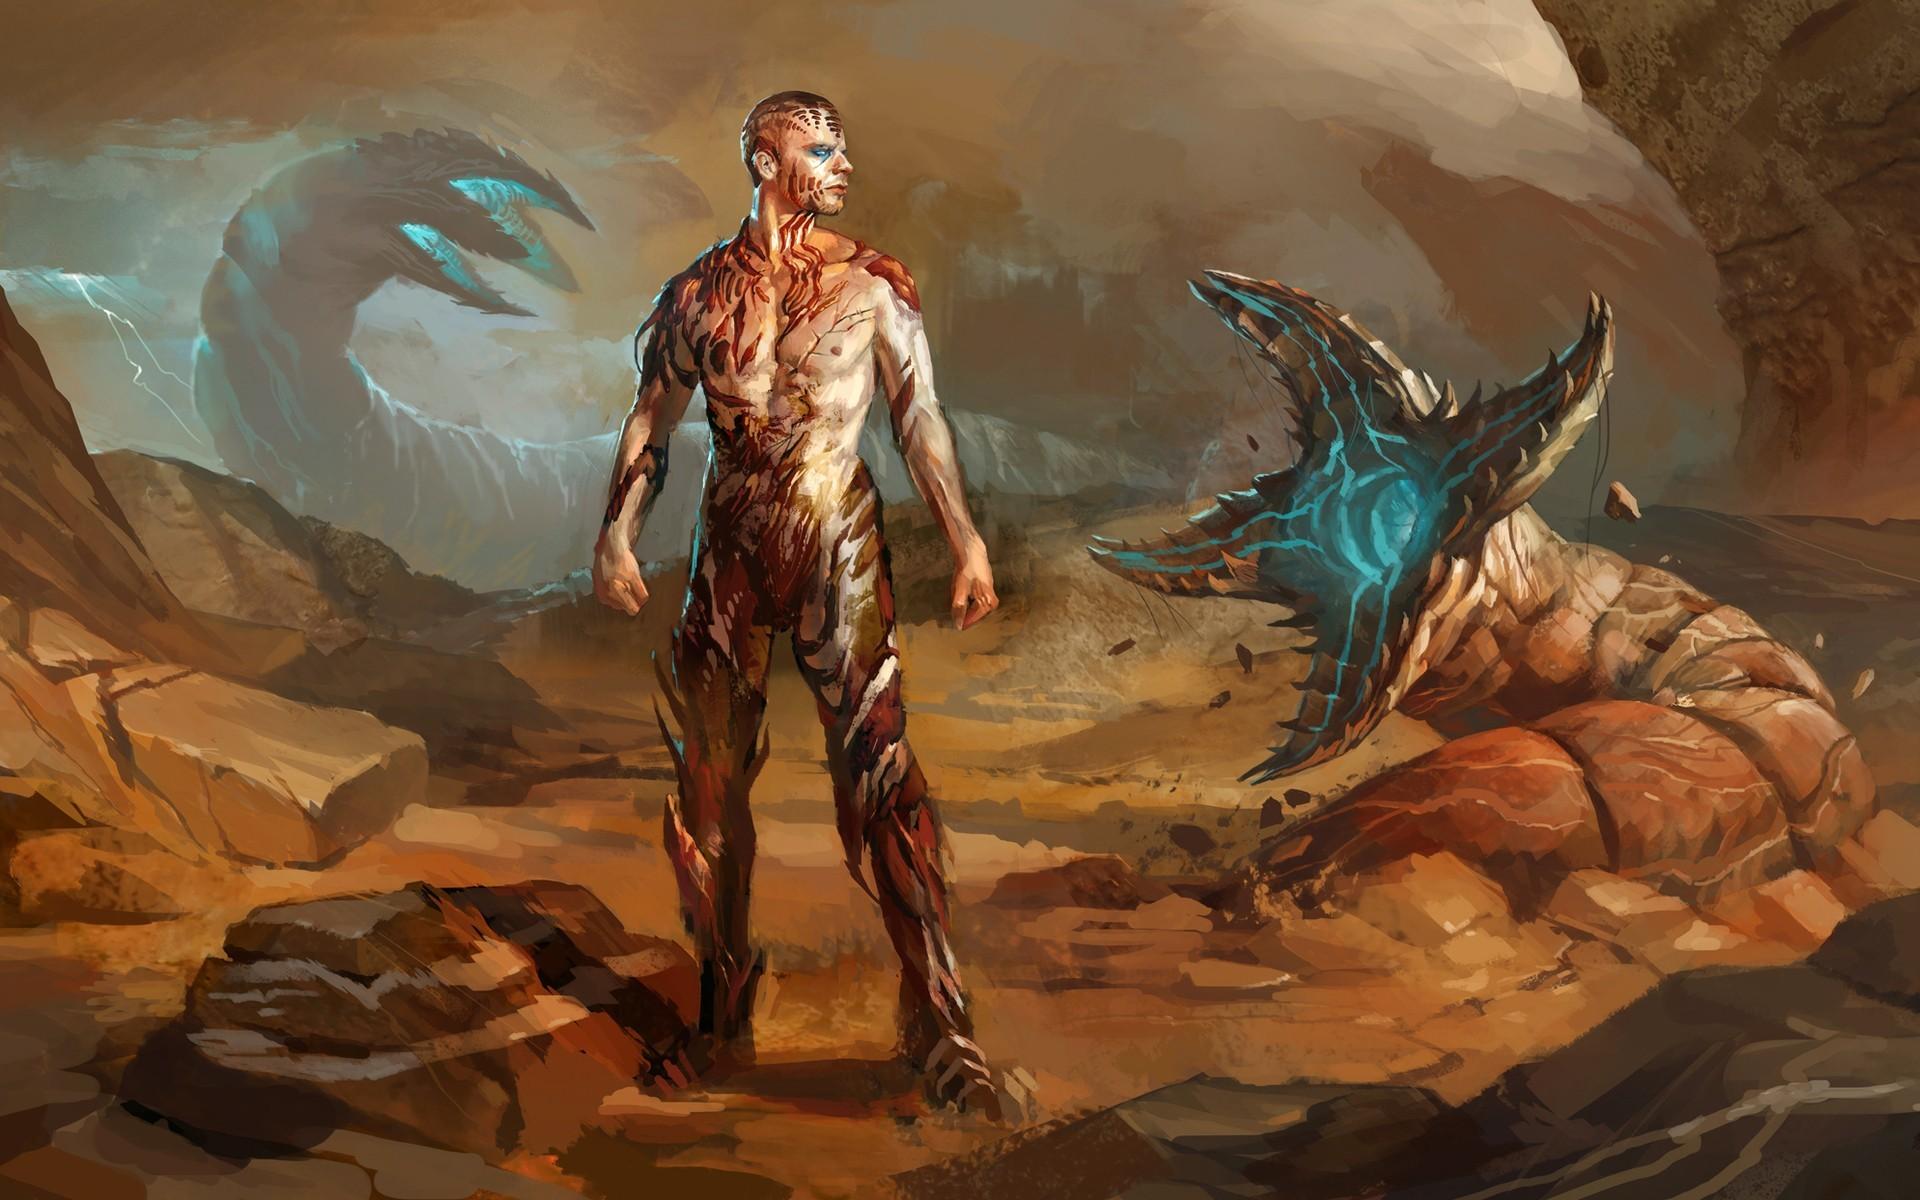 Sci Fi – People Monster Creature Landscape Wallpaper